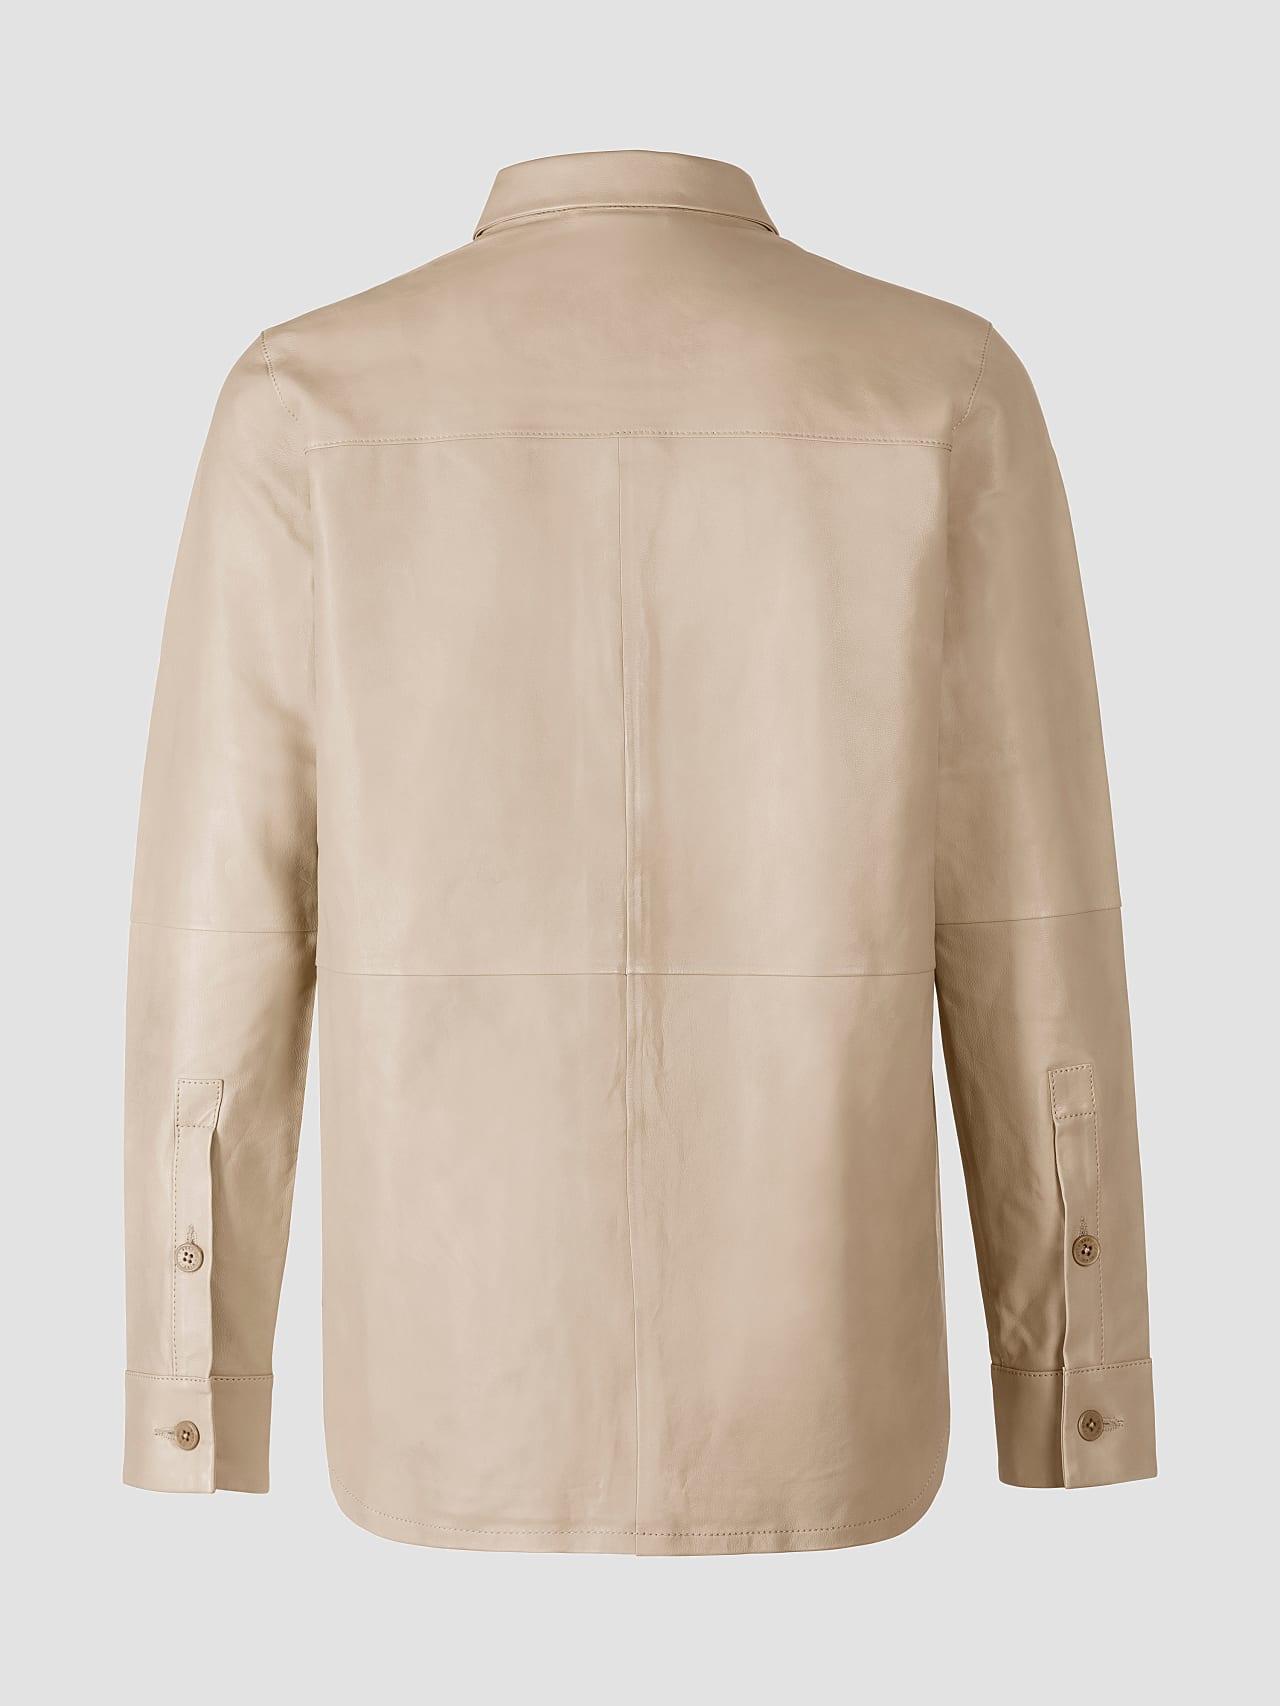 LEORD V1.Y5.01 Leather Shirt Sand Left Alpha Tauri